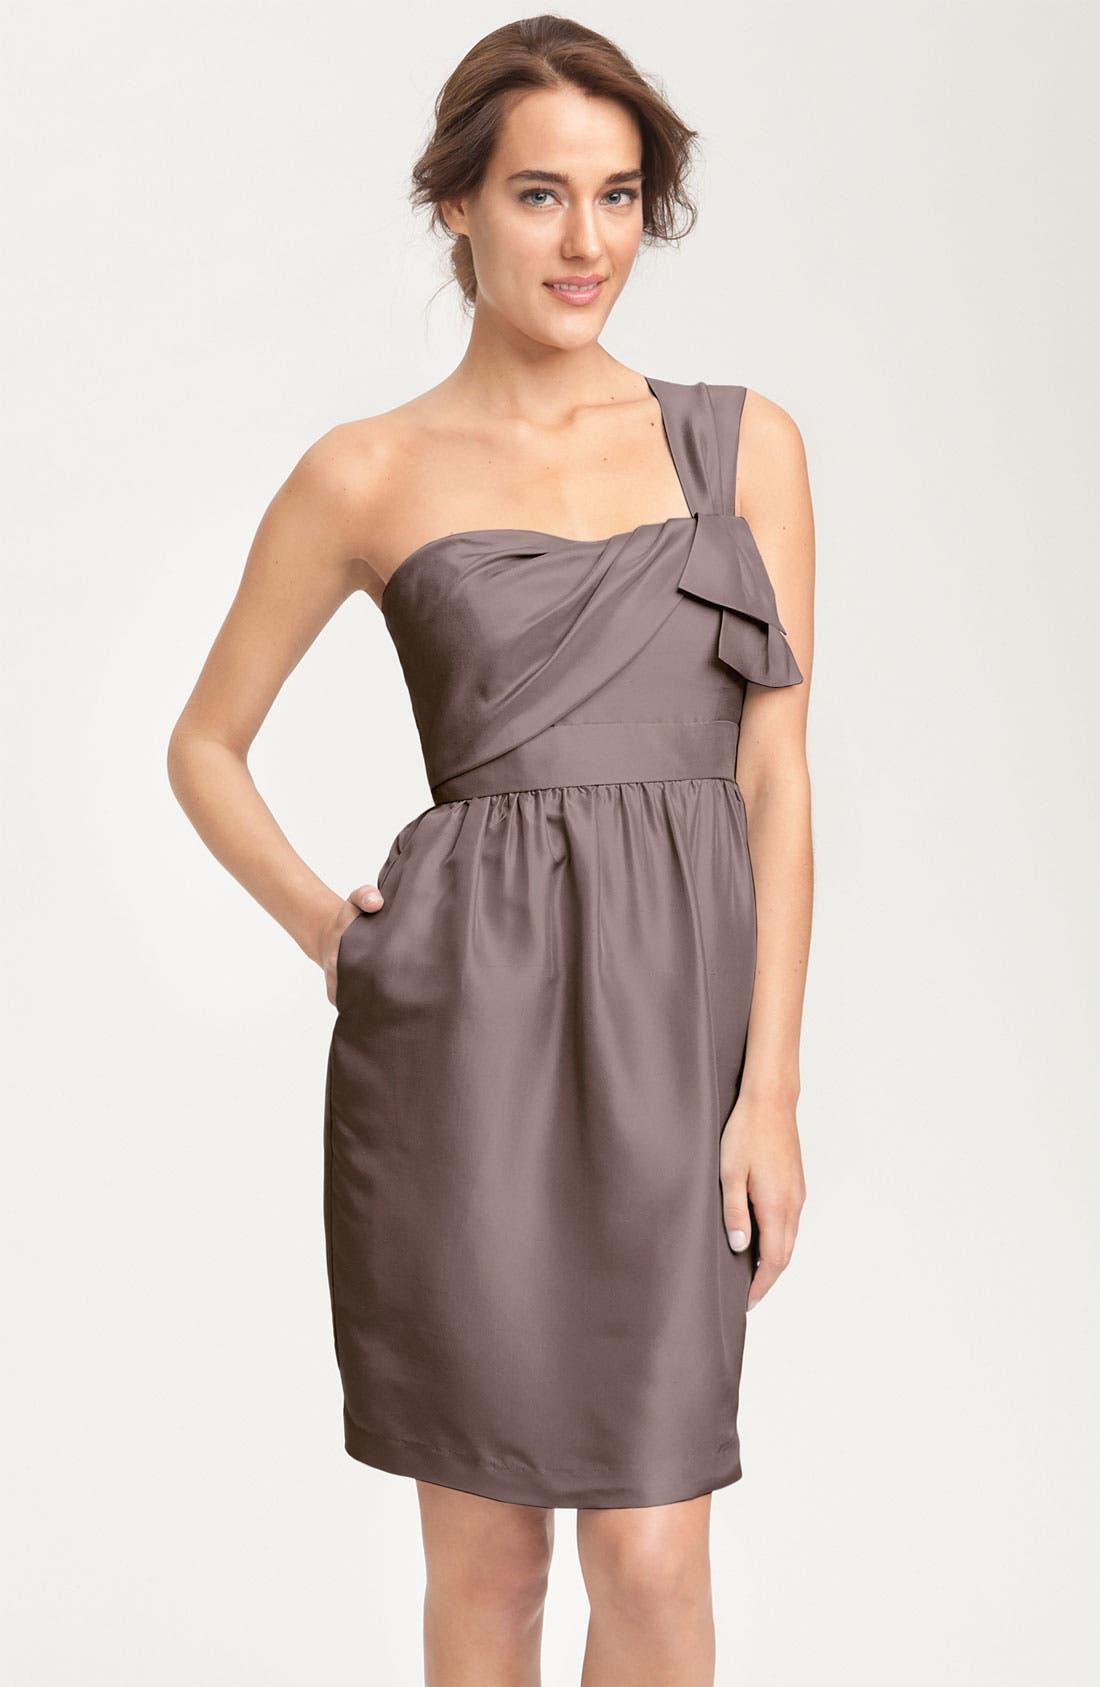 JENNY YOO, Convertible Shantung Dress, Main thumbnail 1, color, 020